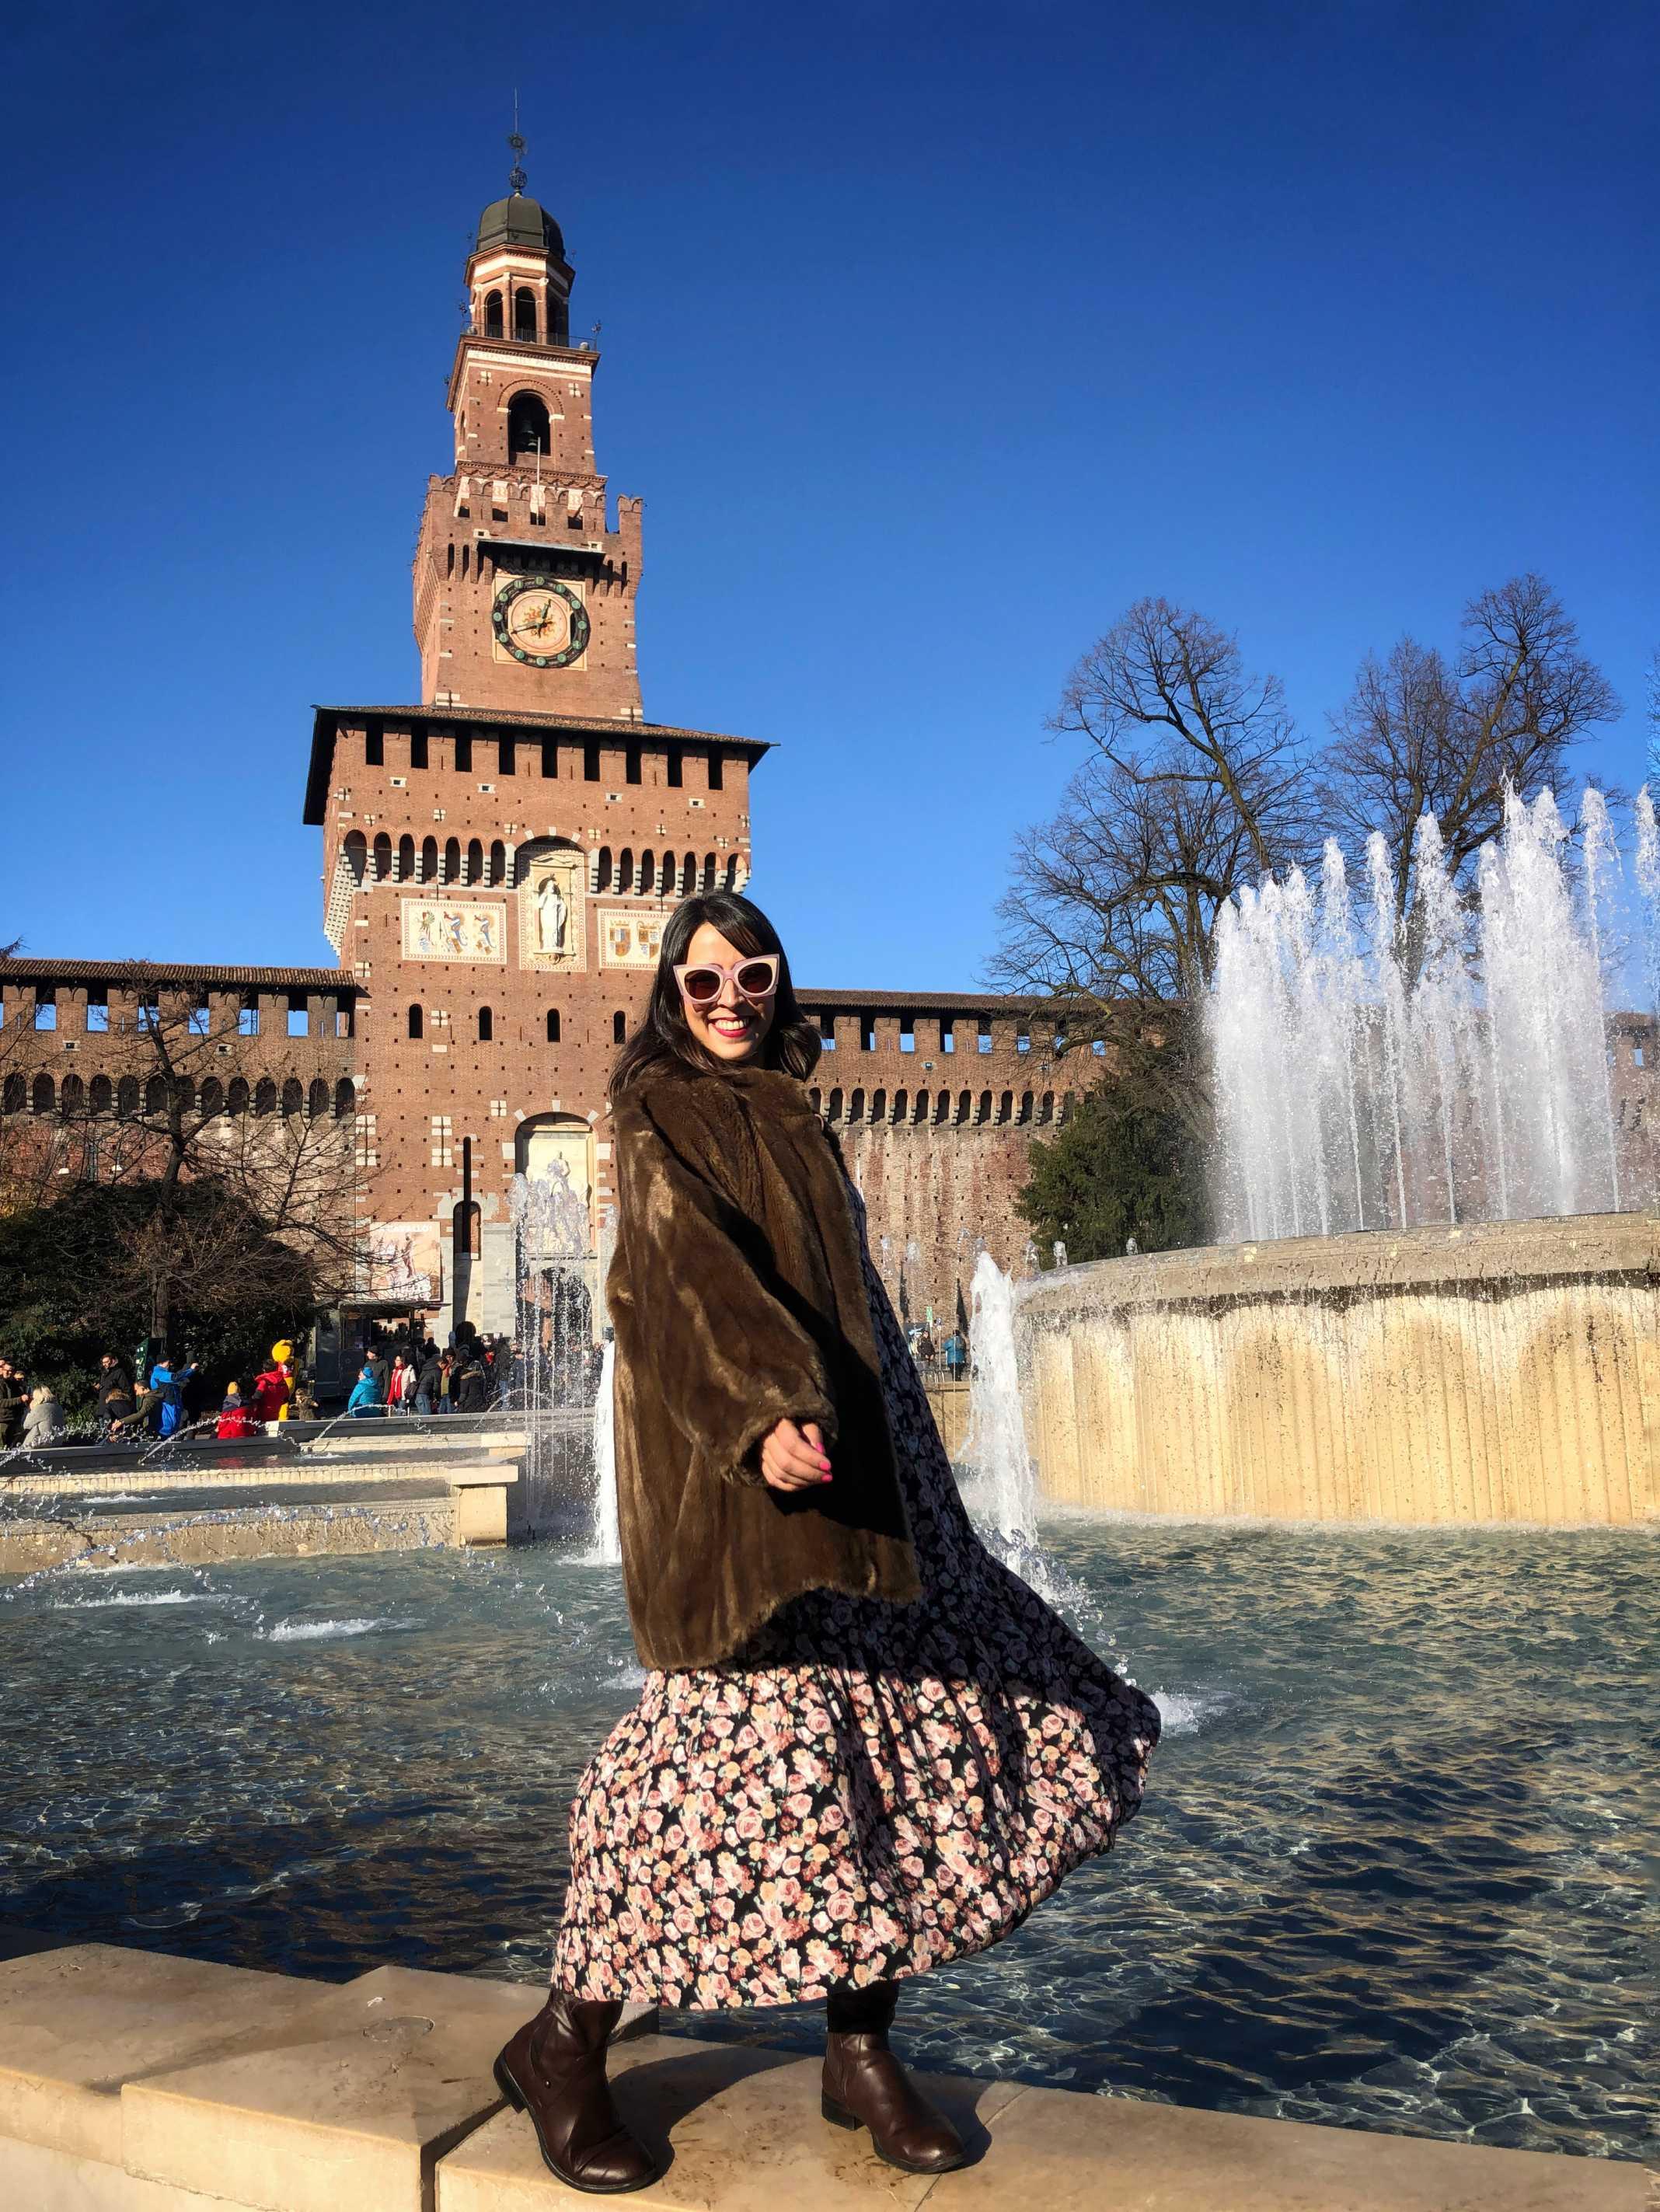 Castelo Milão Itália